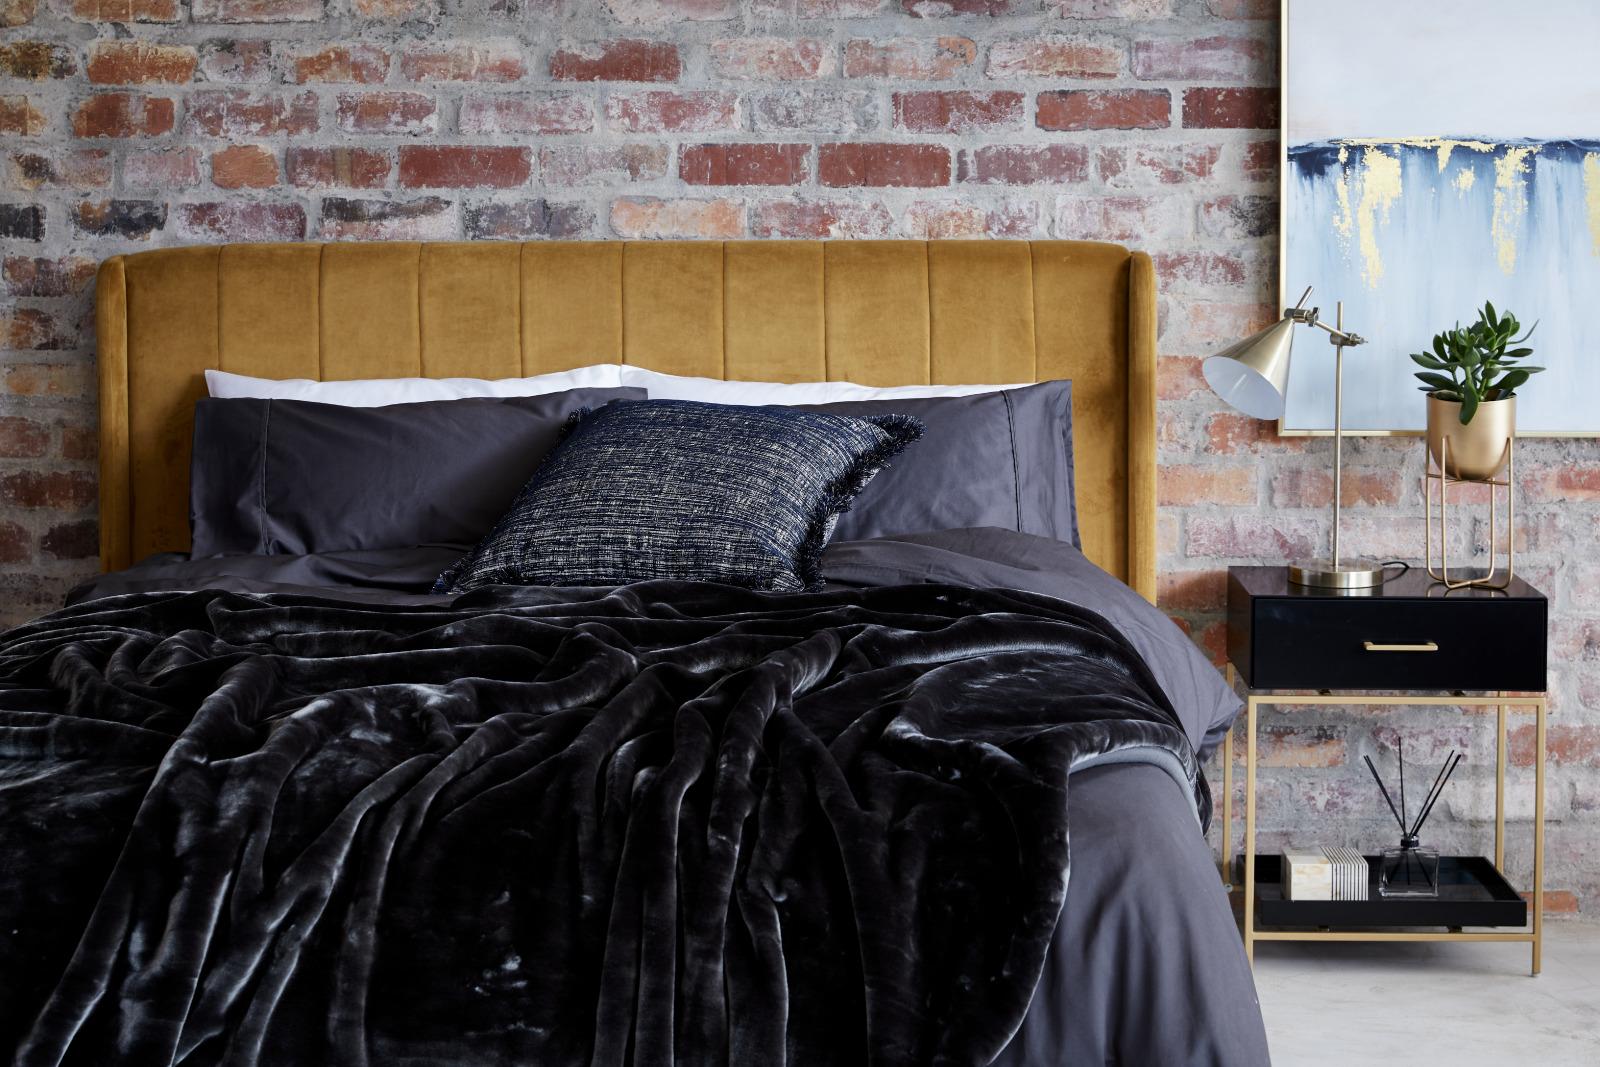 5 WAYS TO CREATE YOUR SLEEP SANCTUARY